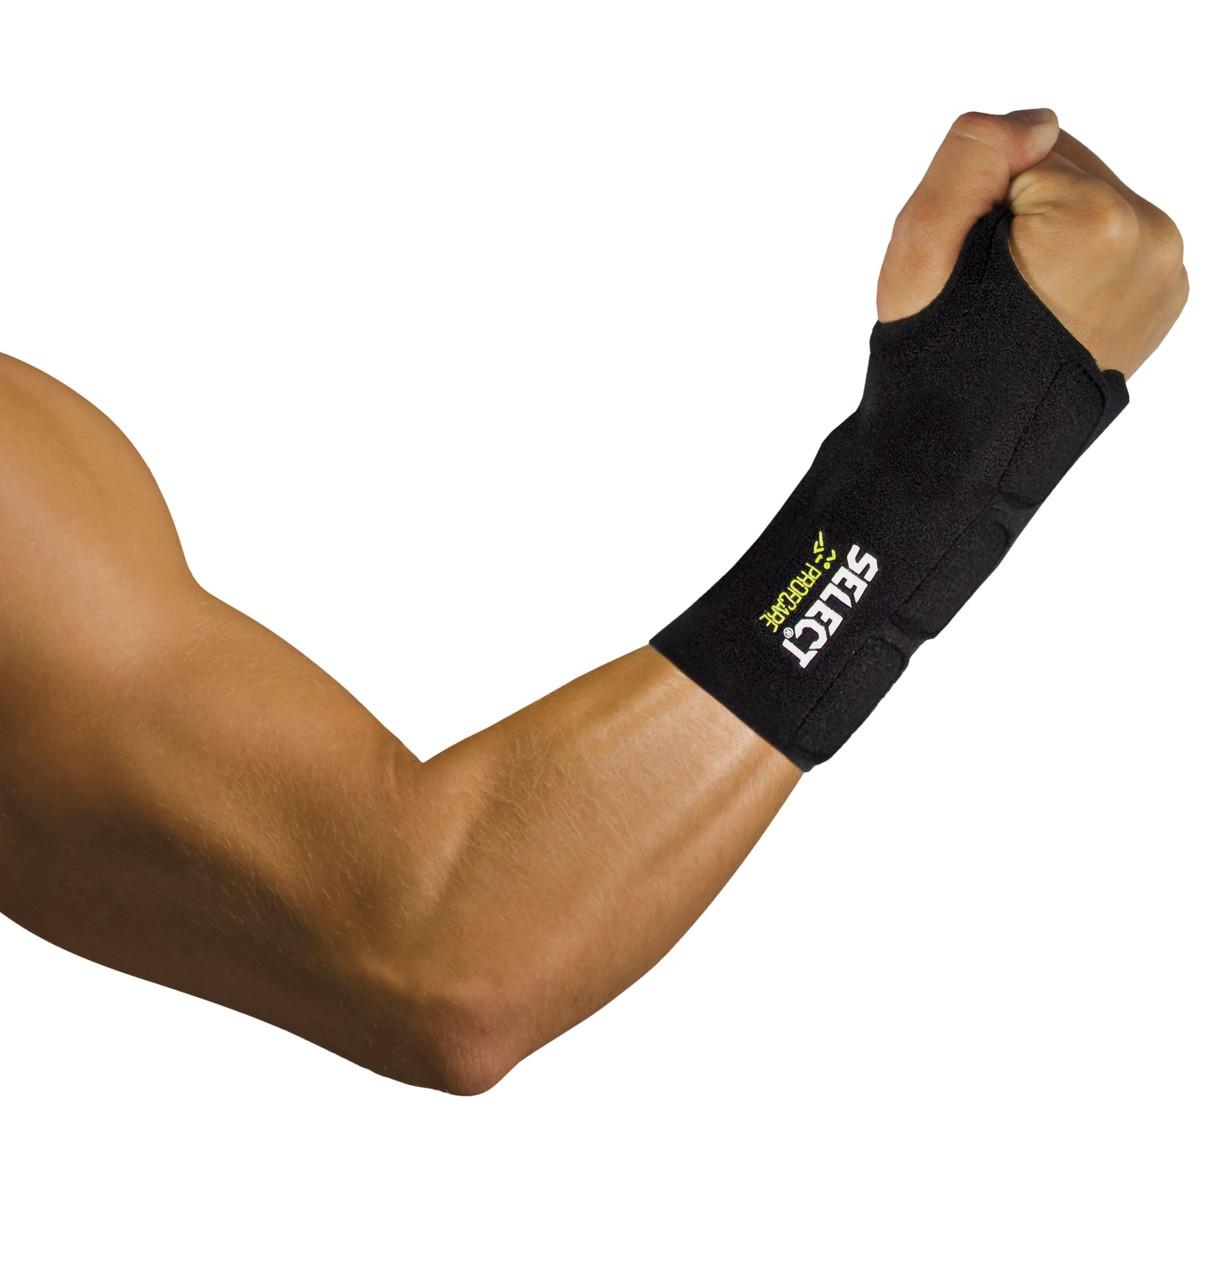 Бандаж Select Wrist support 6701  SELECT Wrist support 6701 XL/XXL